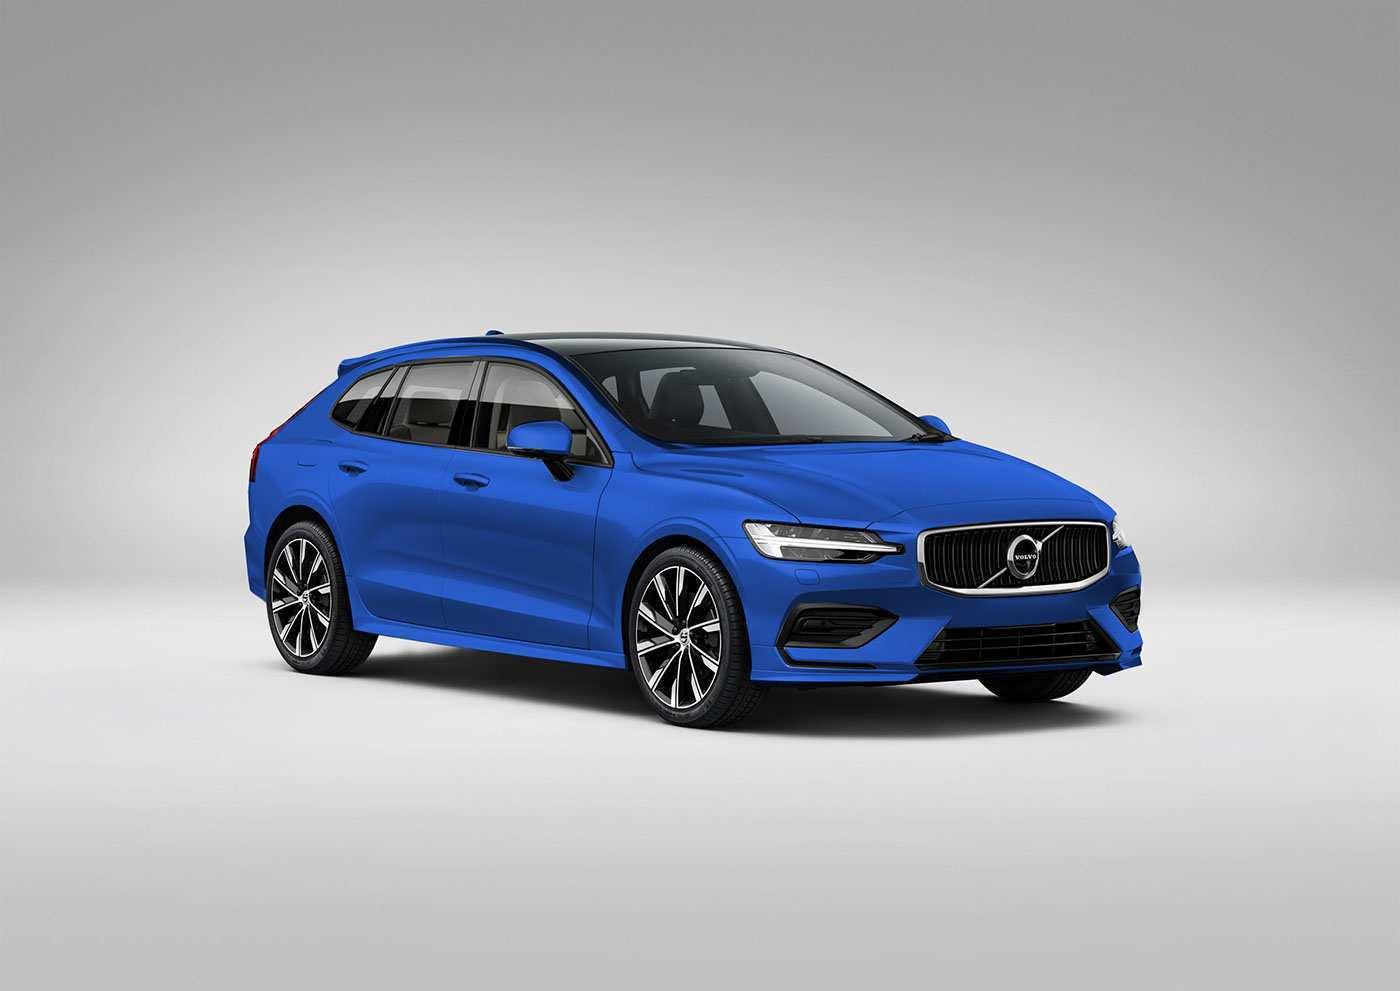 64 New Volvo 2019 V40 Performance and New Engine by Volvo 2019 V40